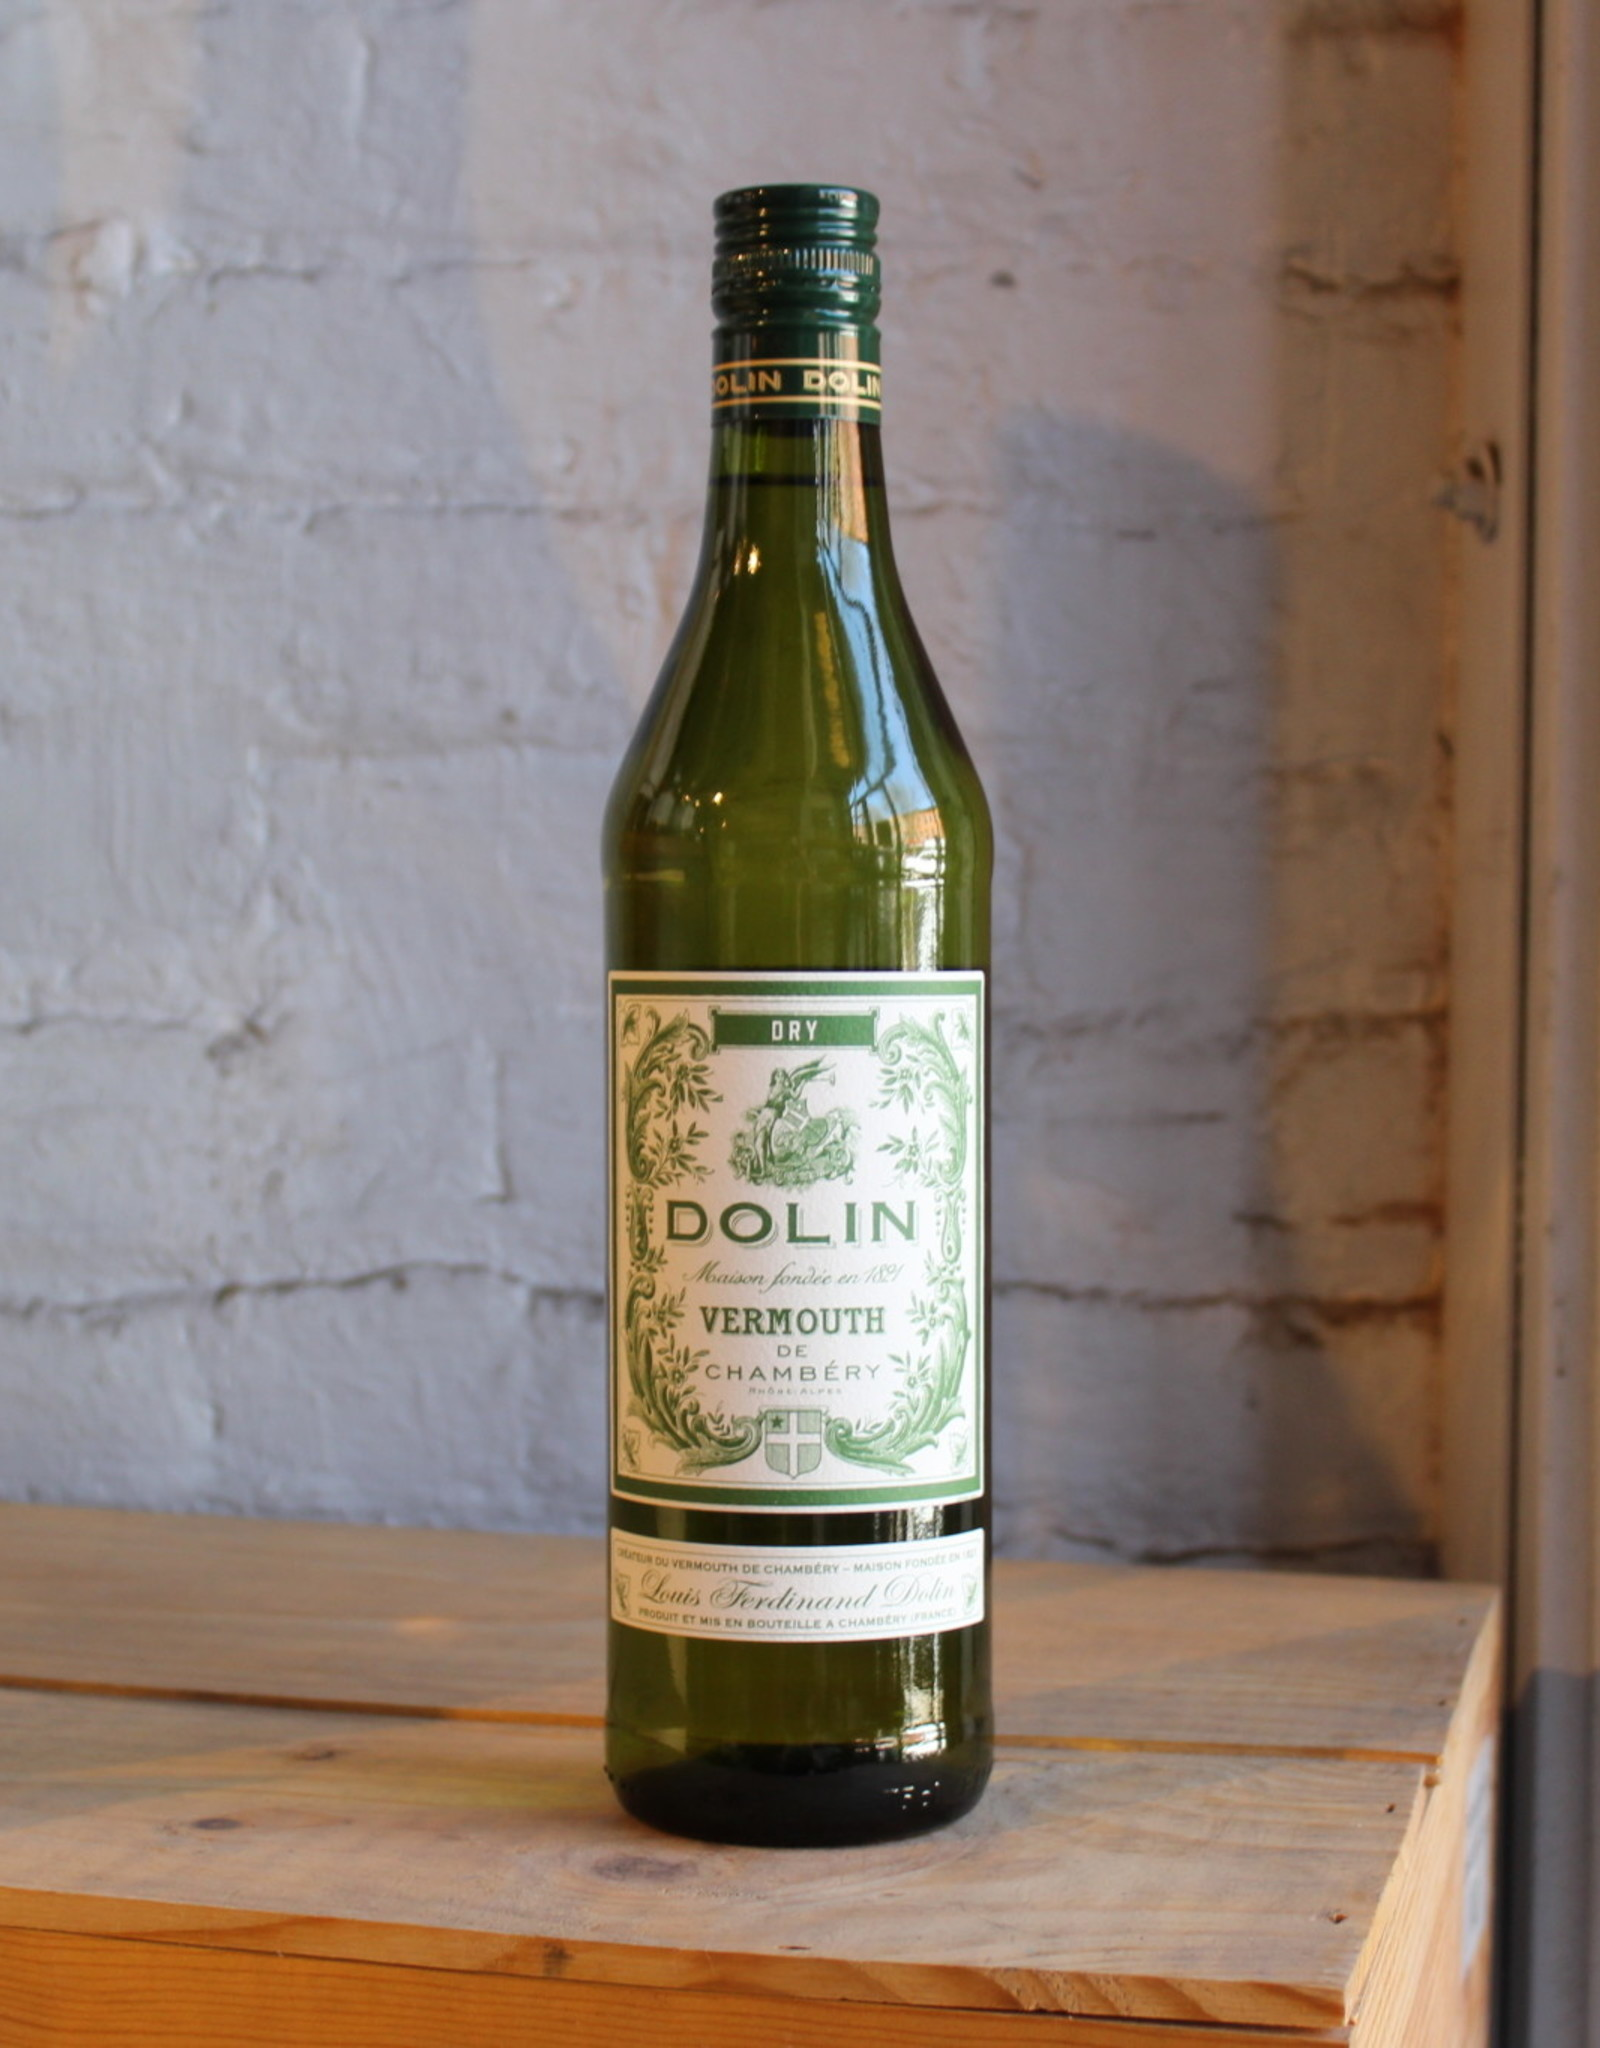 Dolin Vermouth de Chambery Dry - Savoie, France (750ml)